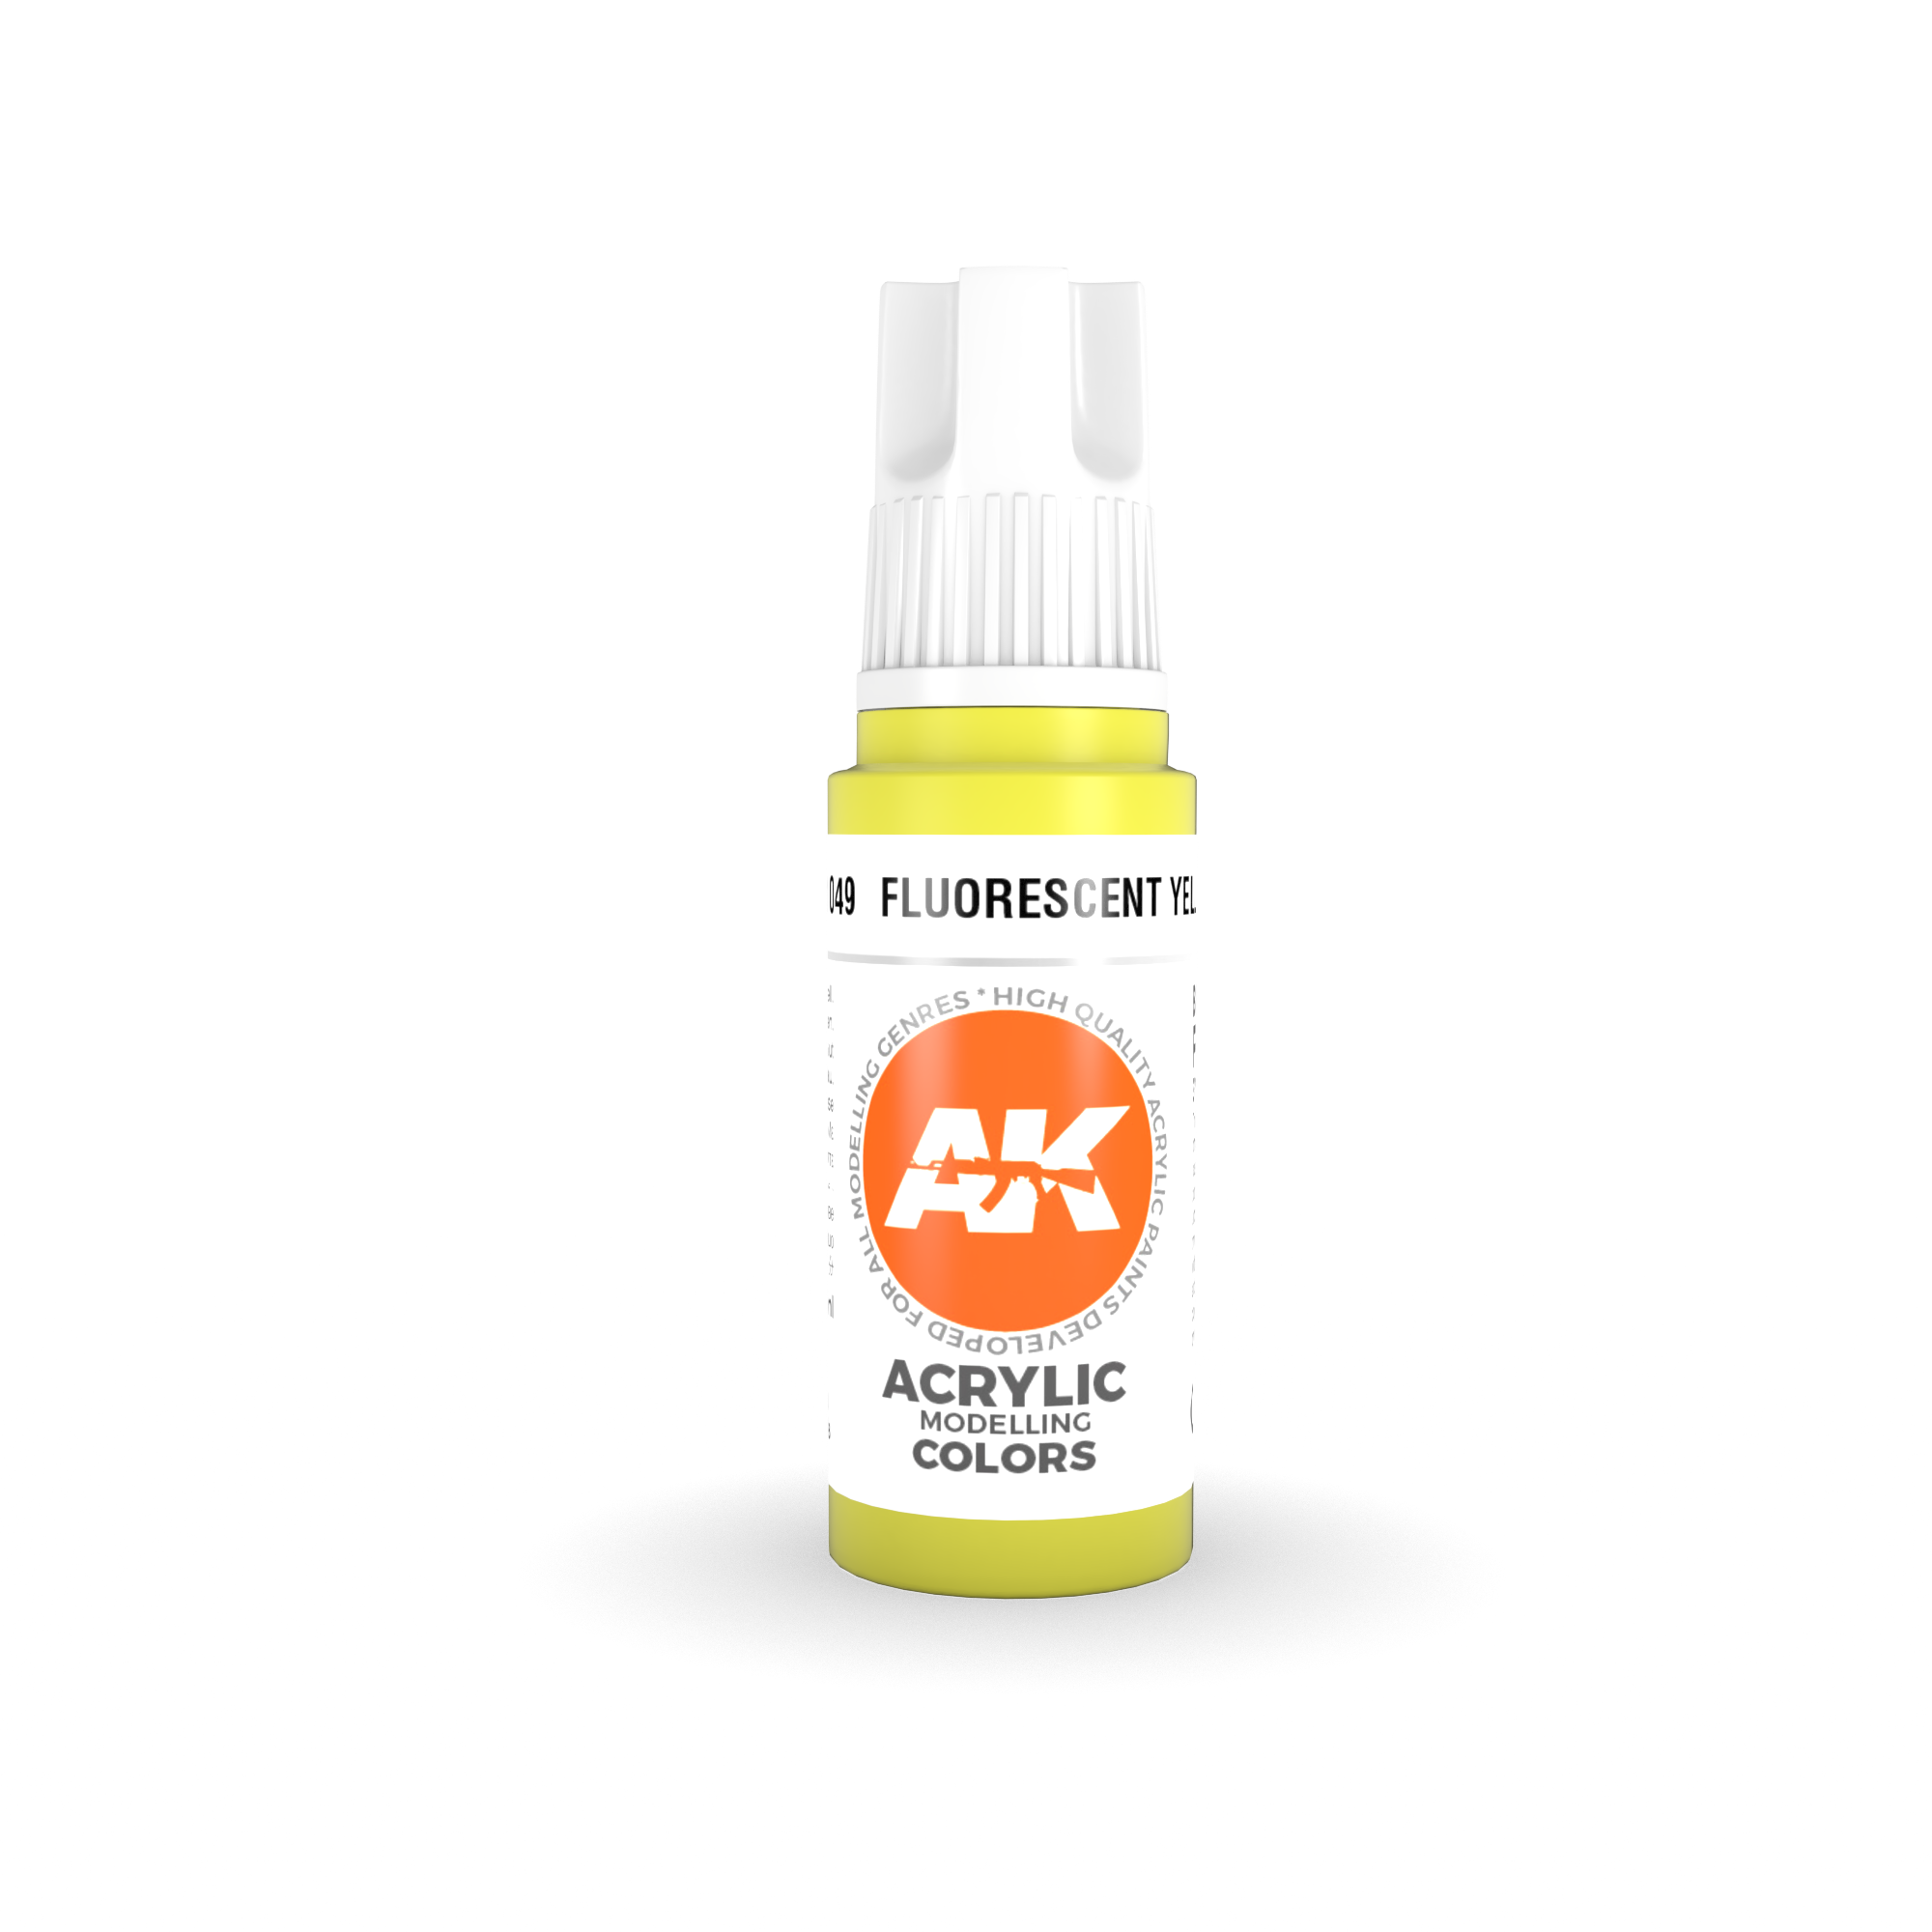 AK-Interactive Fluorescent Yellow Acrylic Modelling Color - 17ml - AK-11049